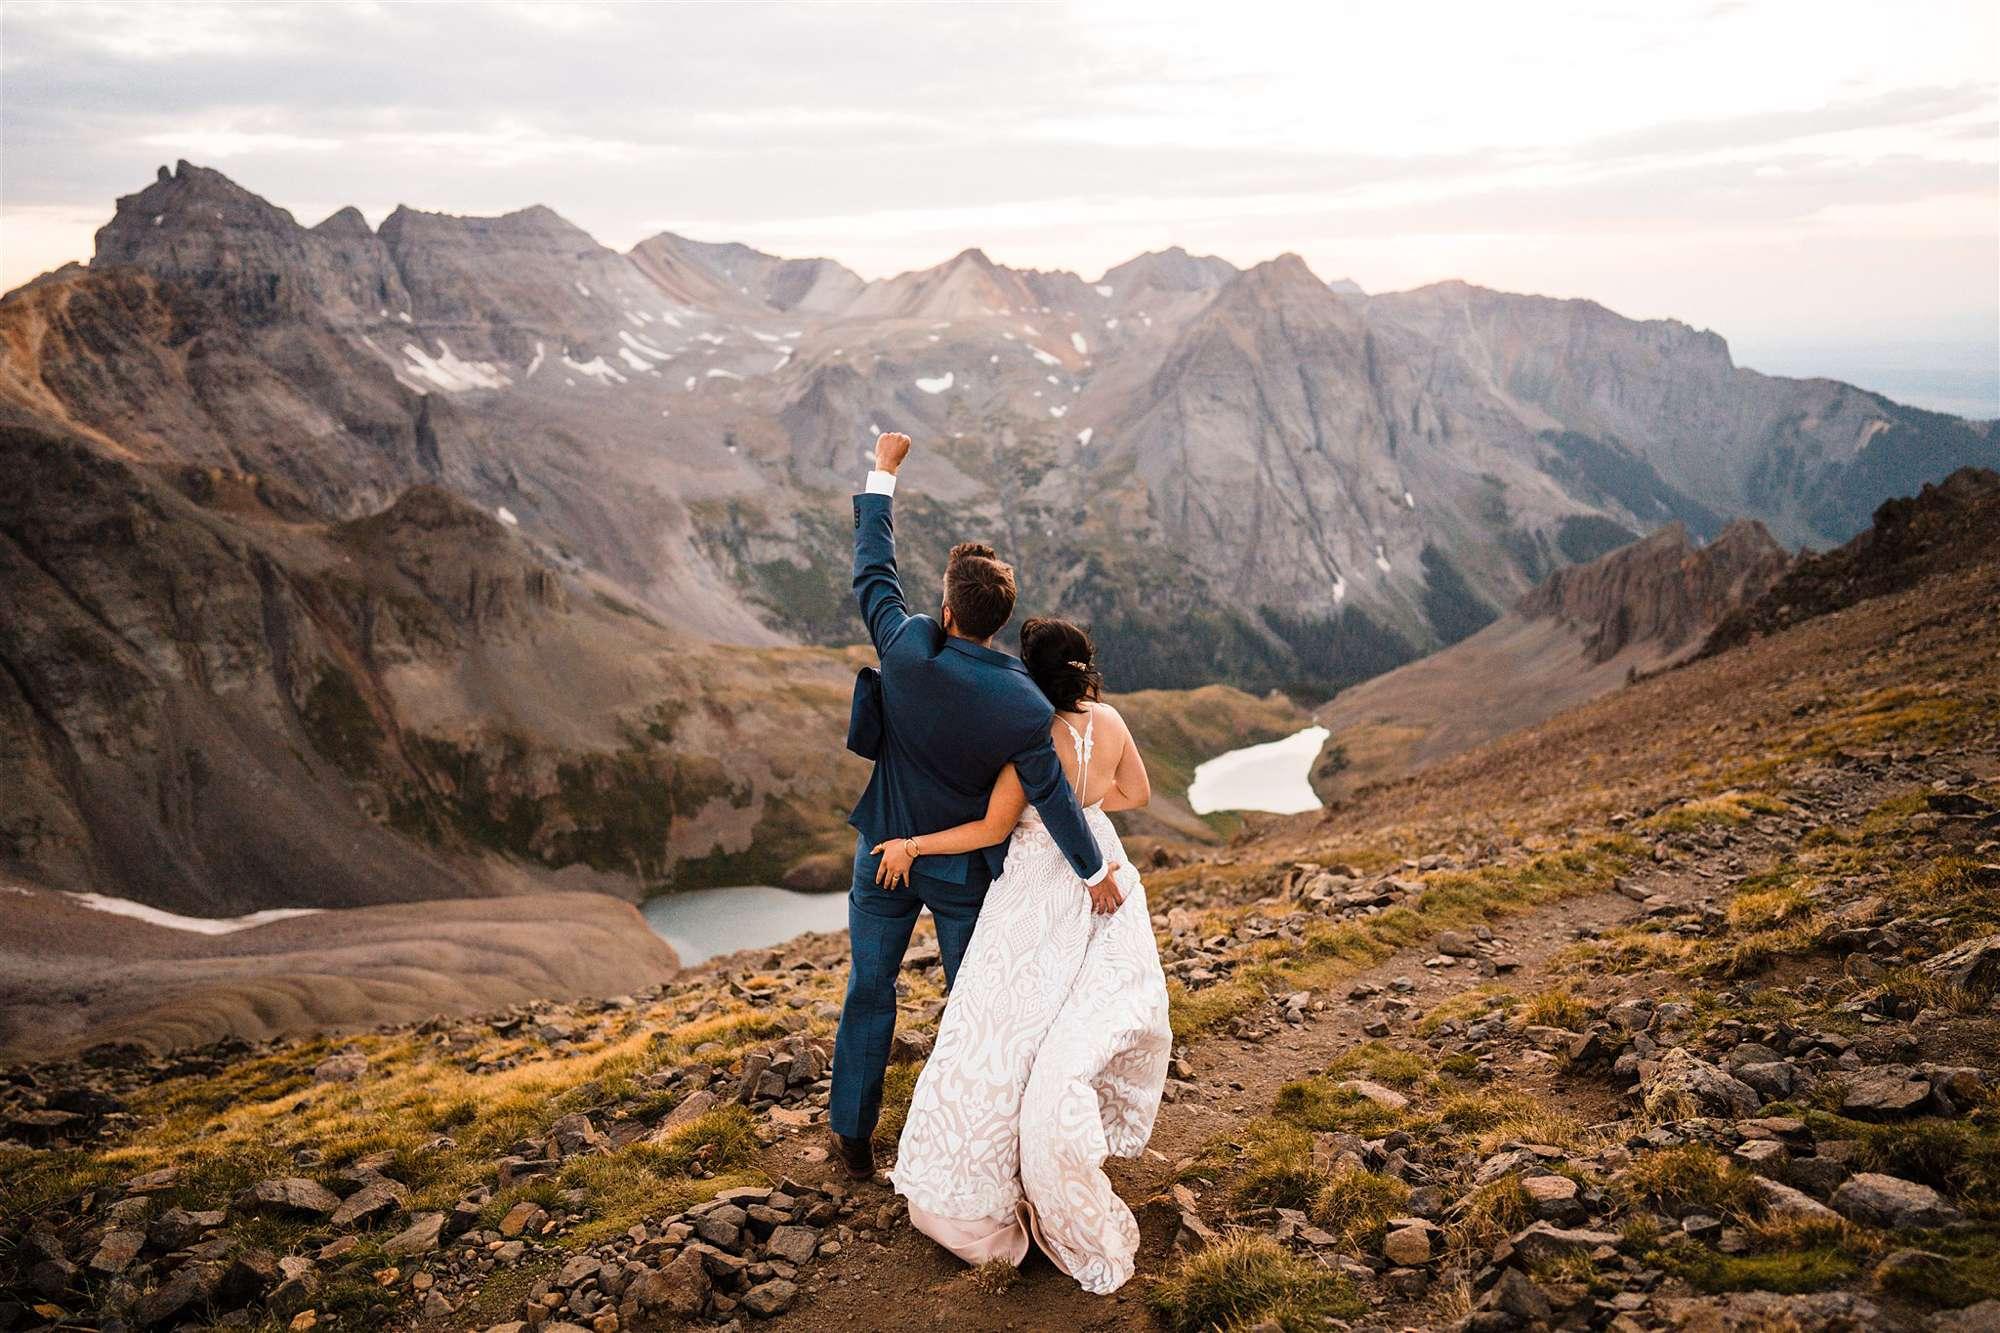 Colorado_Jeeping_Elopement_Emily_Matt_The_Foxes_Photography_0049.jpg